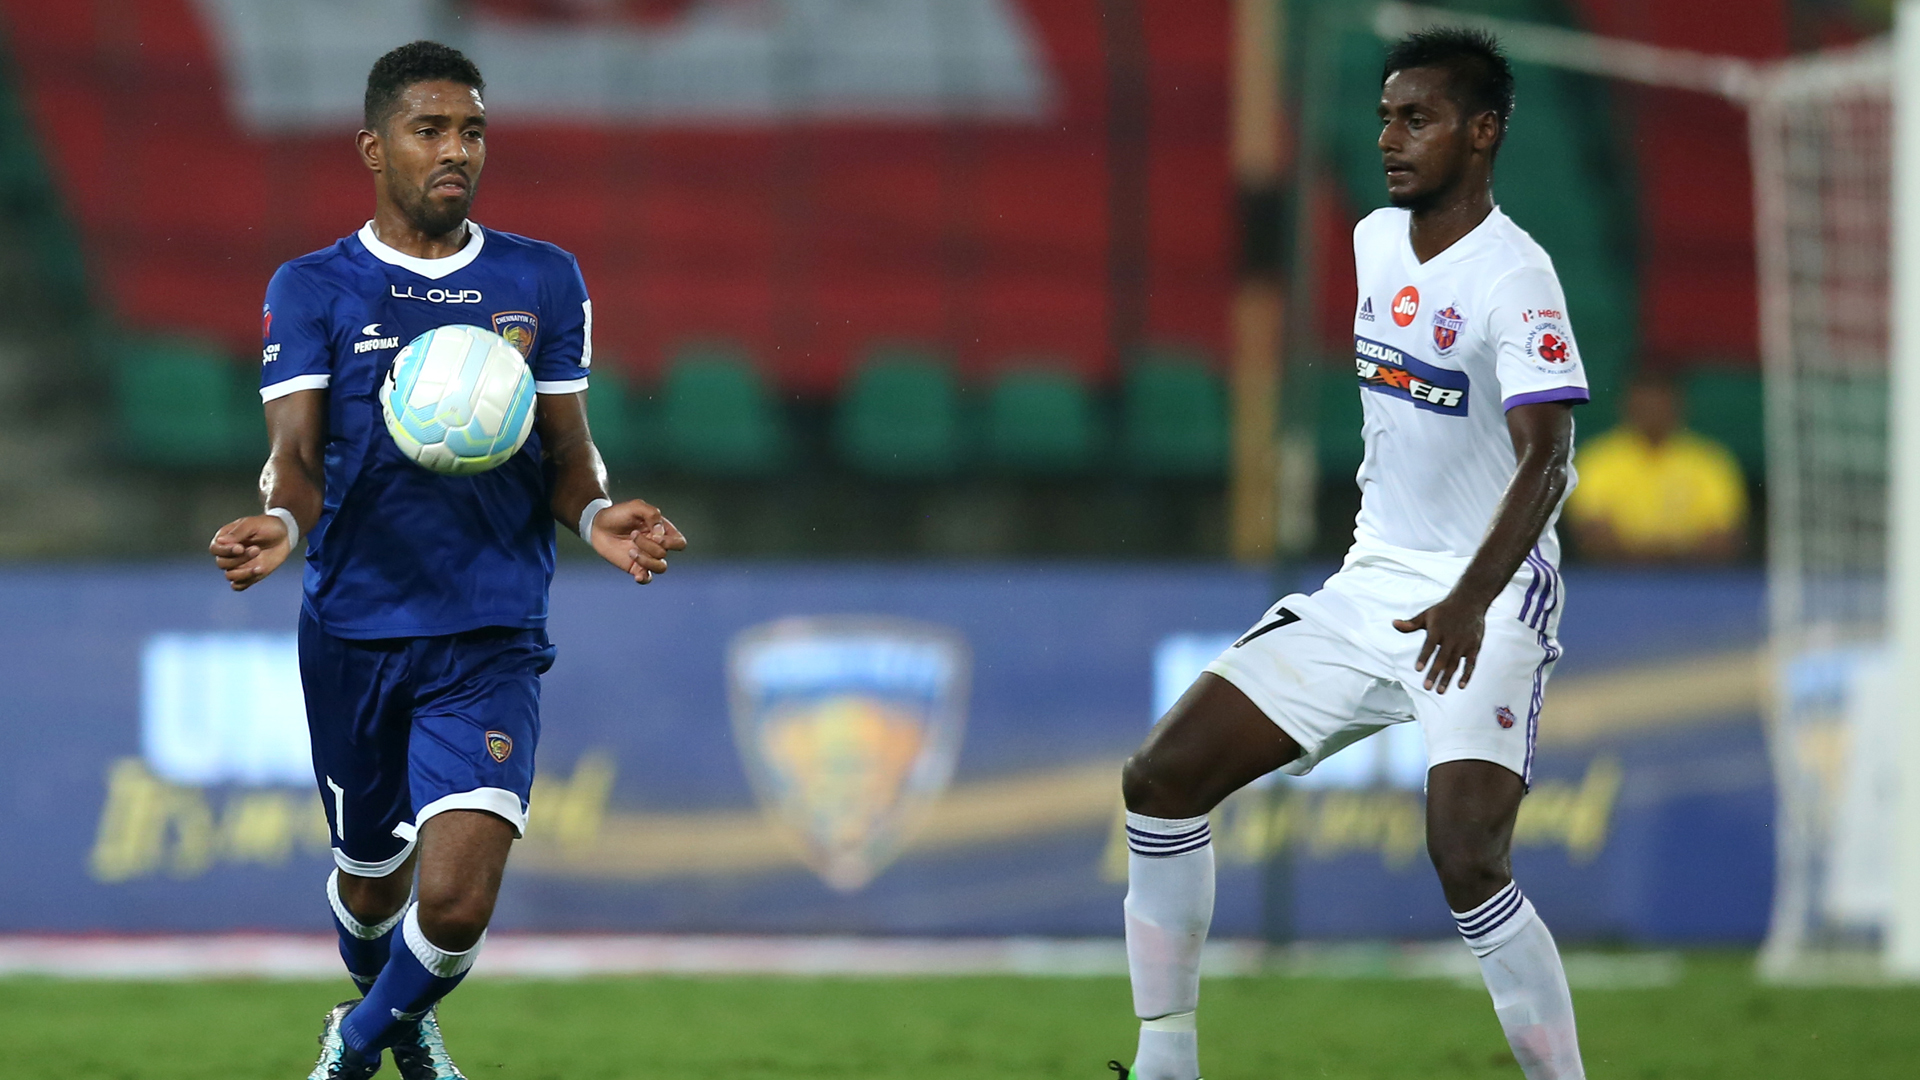 Gregory Nelson Rohit Kumar Chennaiyin FC FC Pune City ISL 4 2017/2018